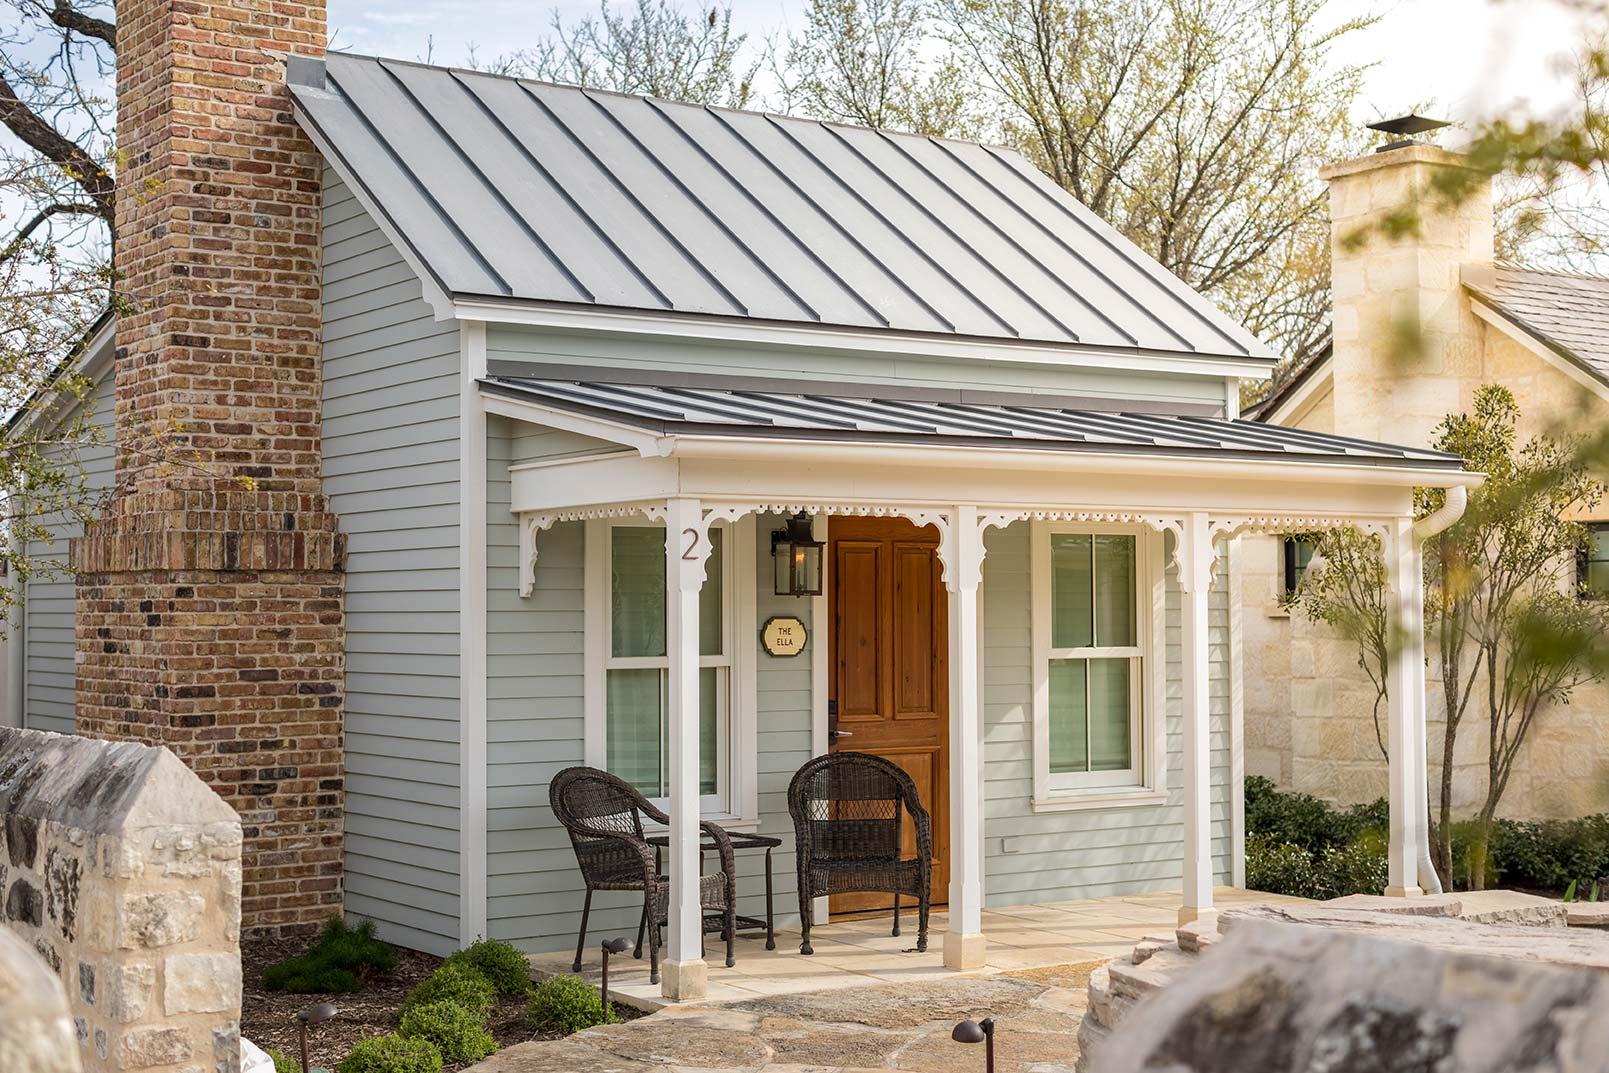 blacksmith-quarters-fredericksburg-realty-hill-countryt-cabins.jpg